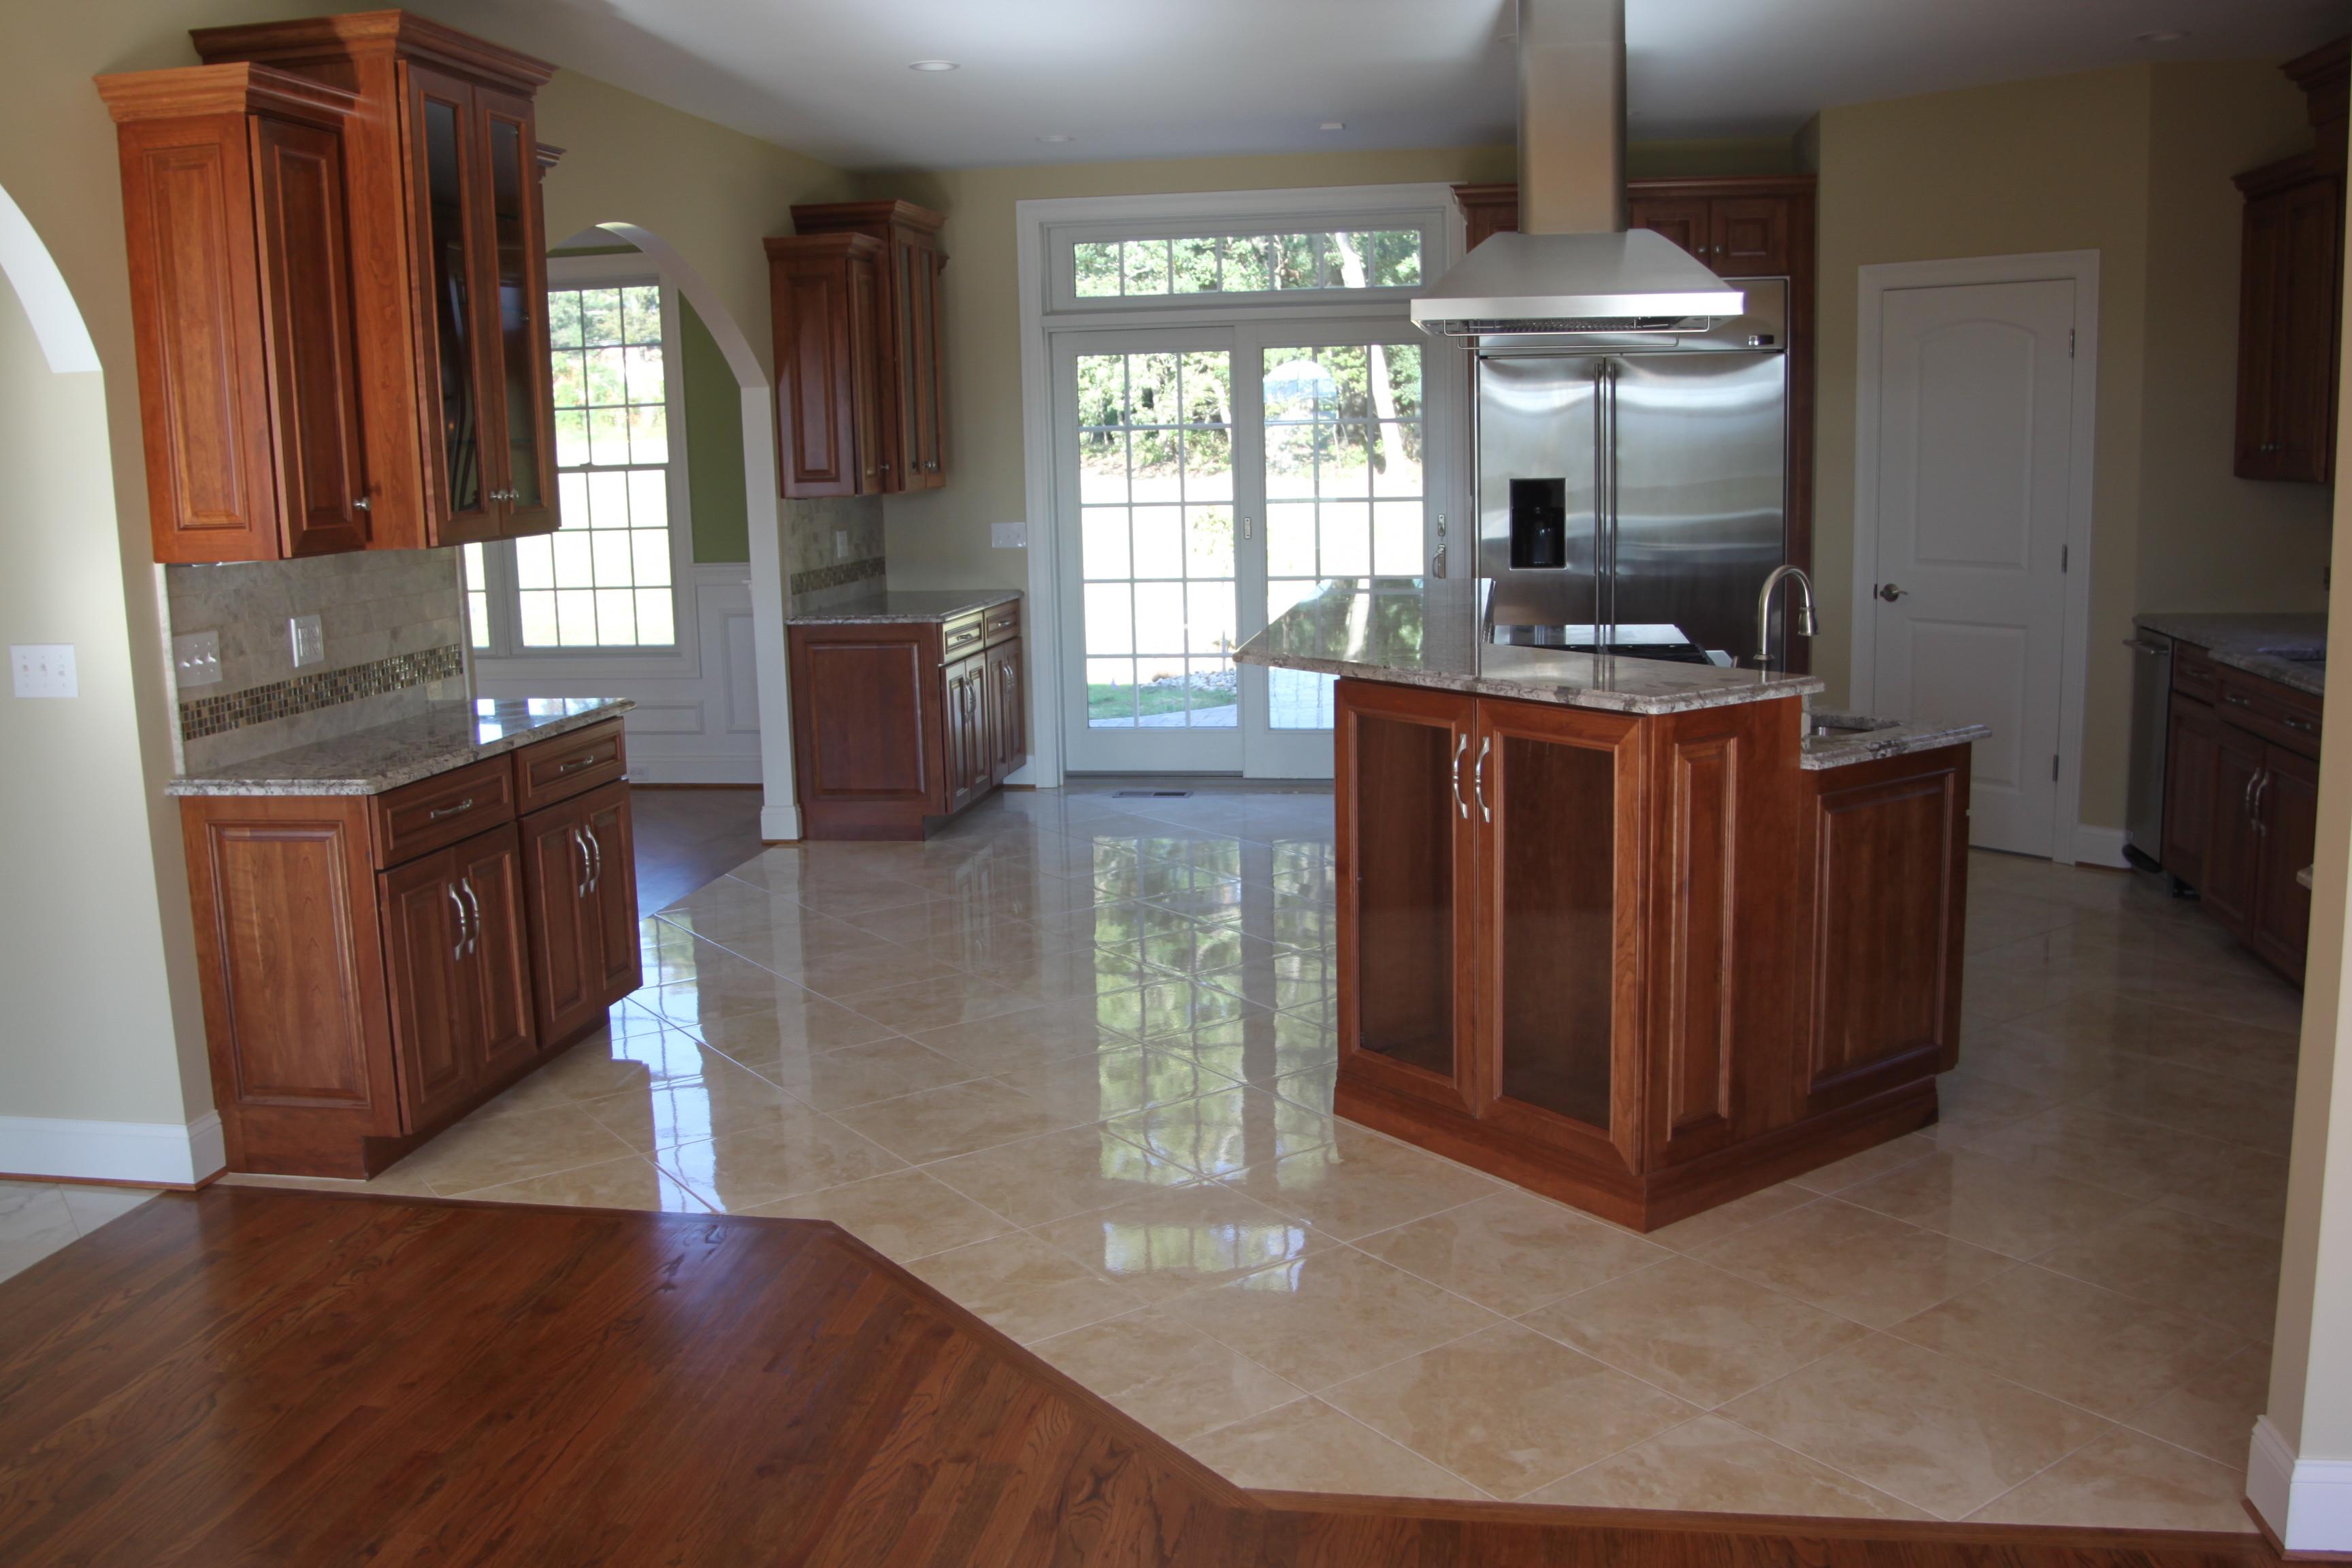 hardwood floor refinishing west hartford ct of cinzia mcfarland dalene flooring with regard to designing kitchen floors